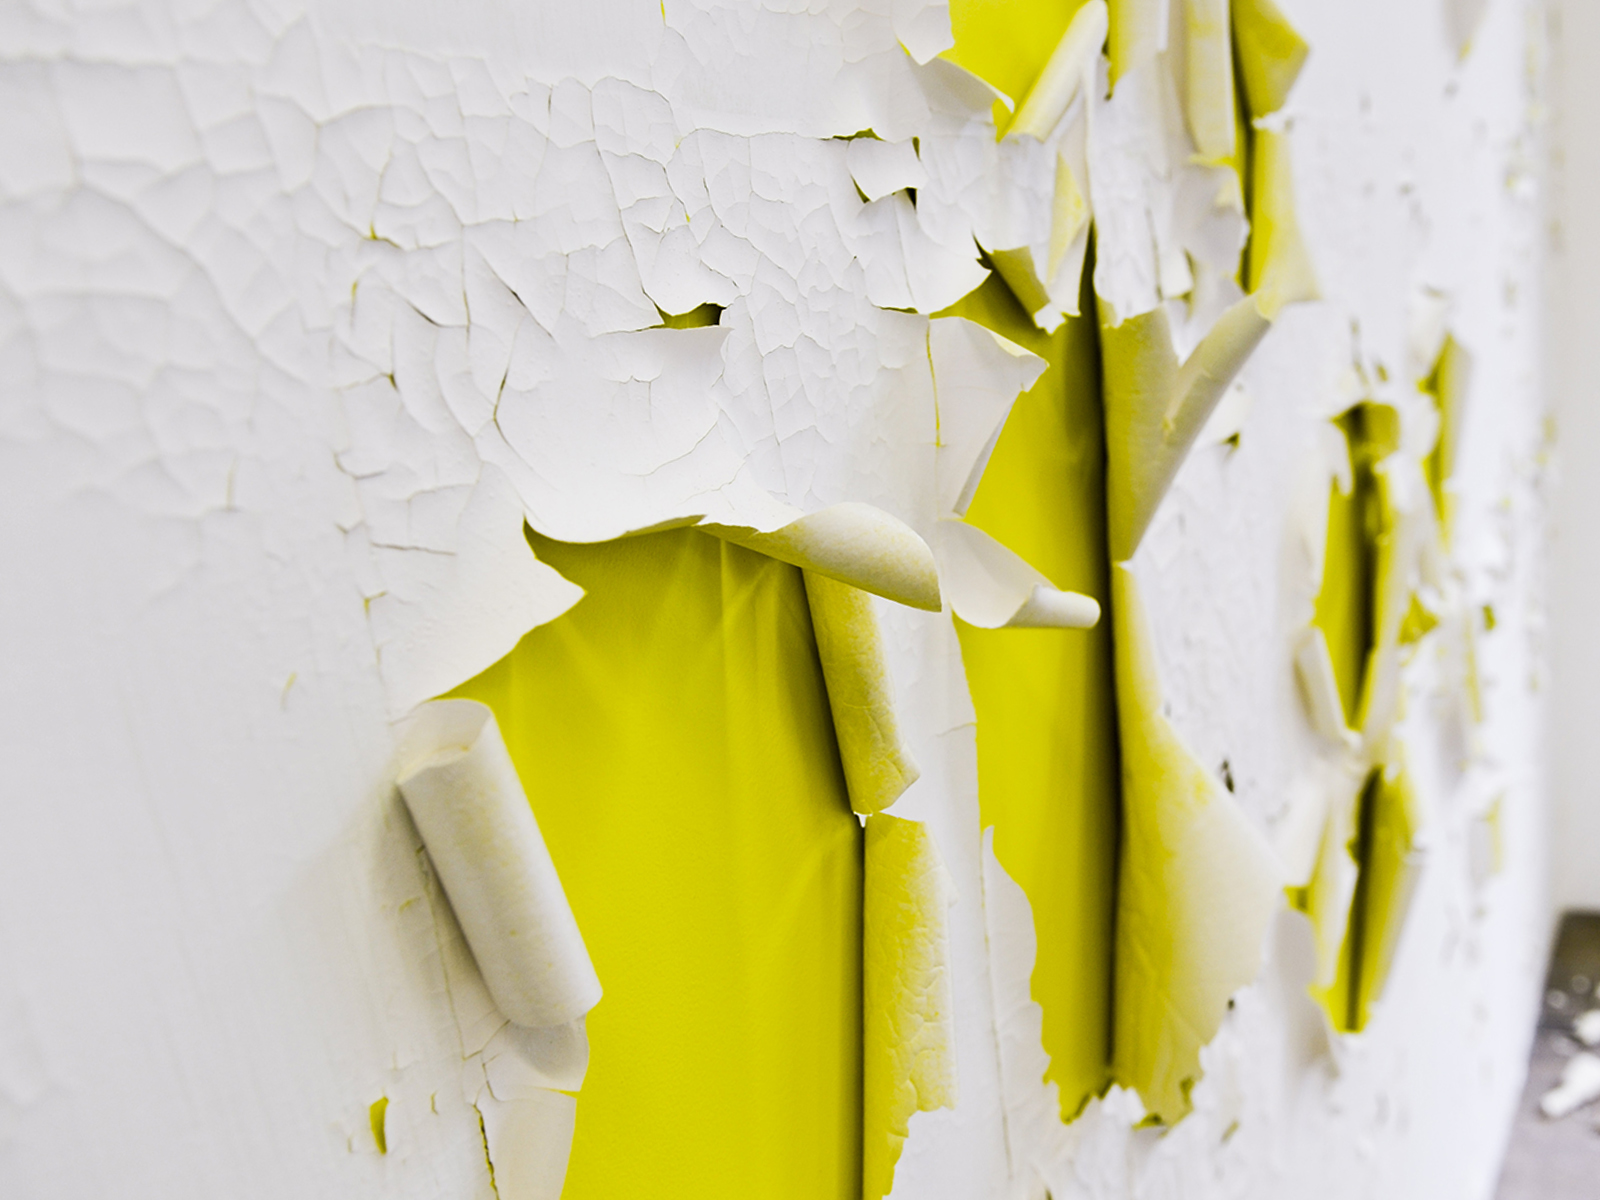 Benoit-Delaunay-artiste-installations-Un Sentiment de Chaleur-11